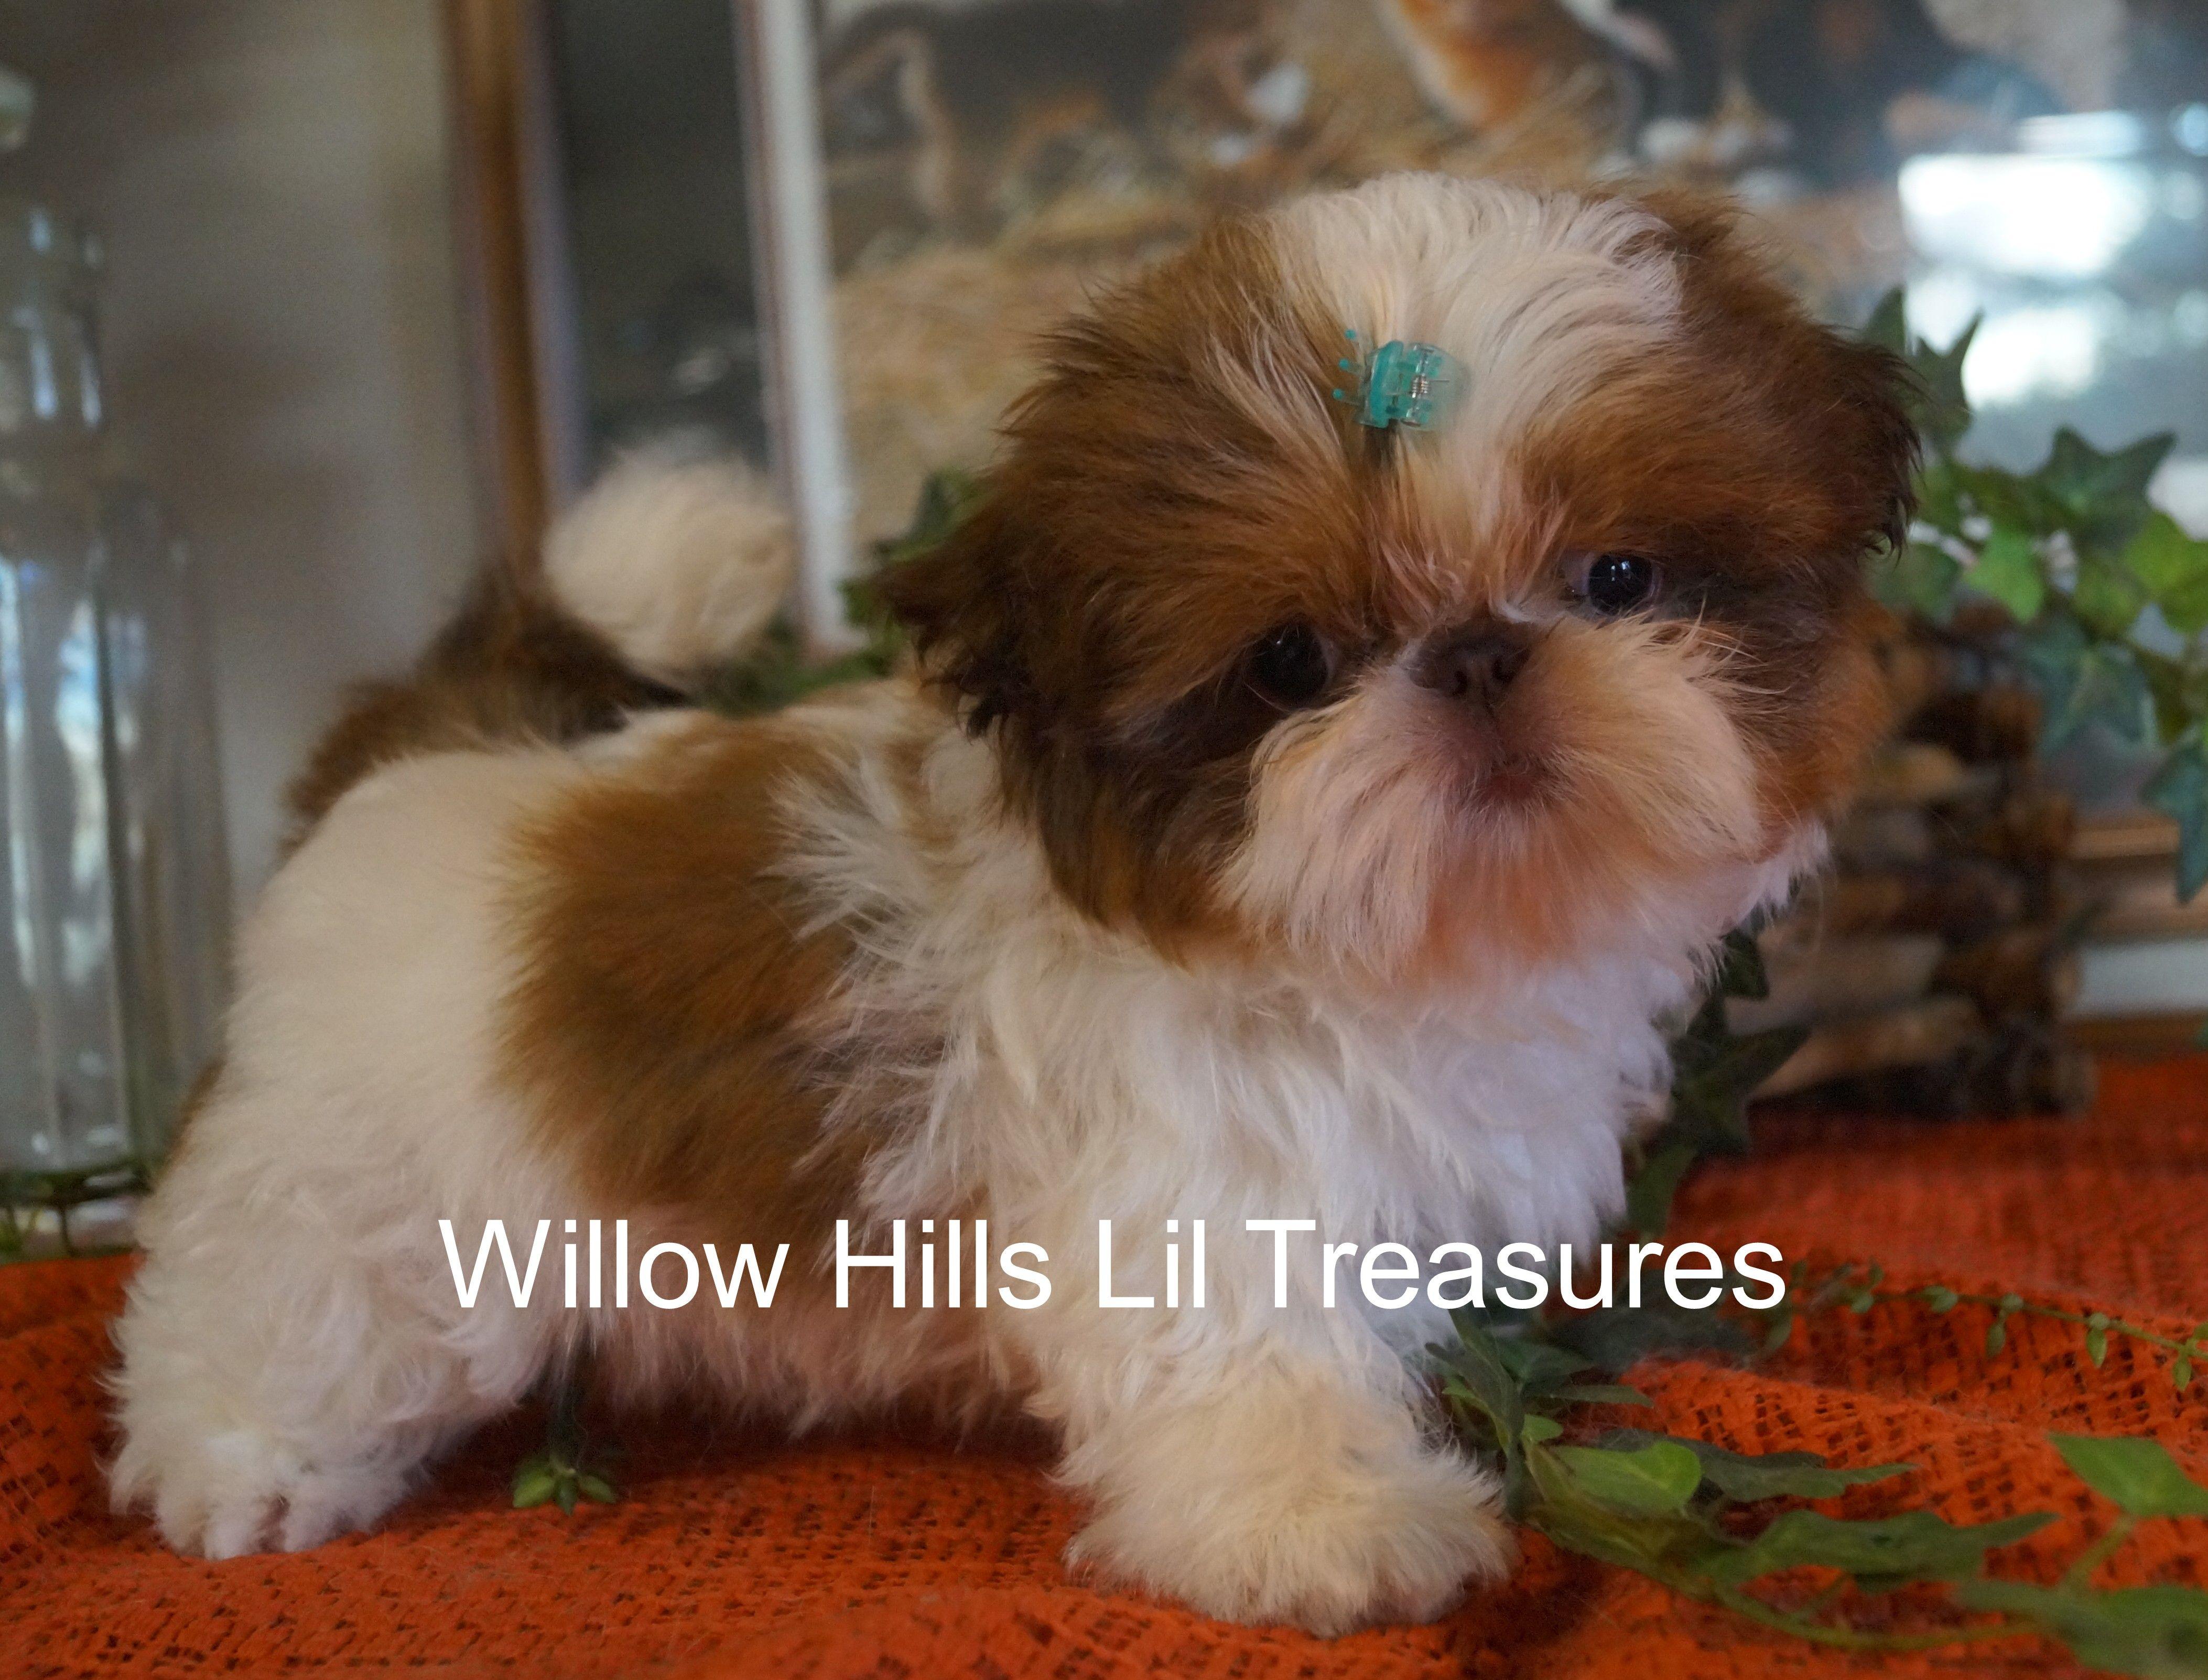 Willow Hills Lil Treasure Shih Tzu Puppy Shih Tzu Puppy Shih Tzu Puppies